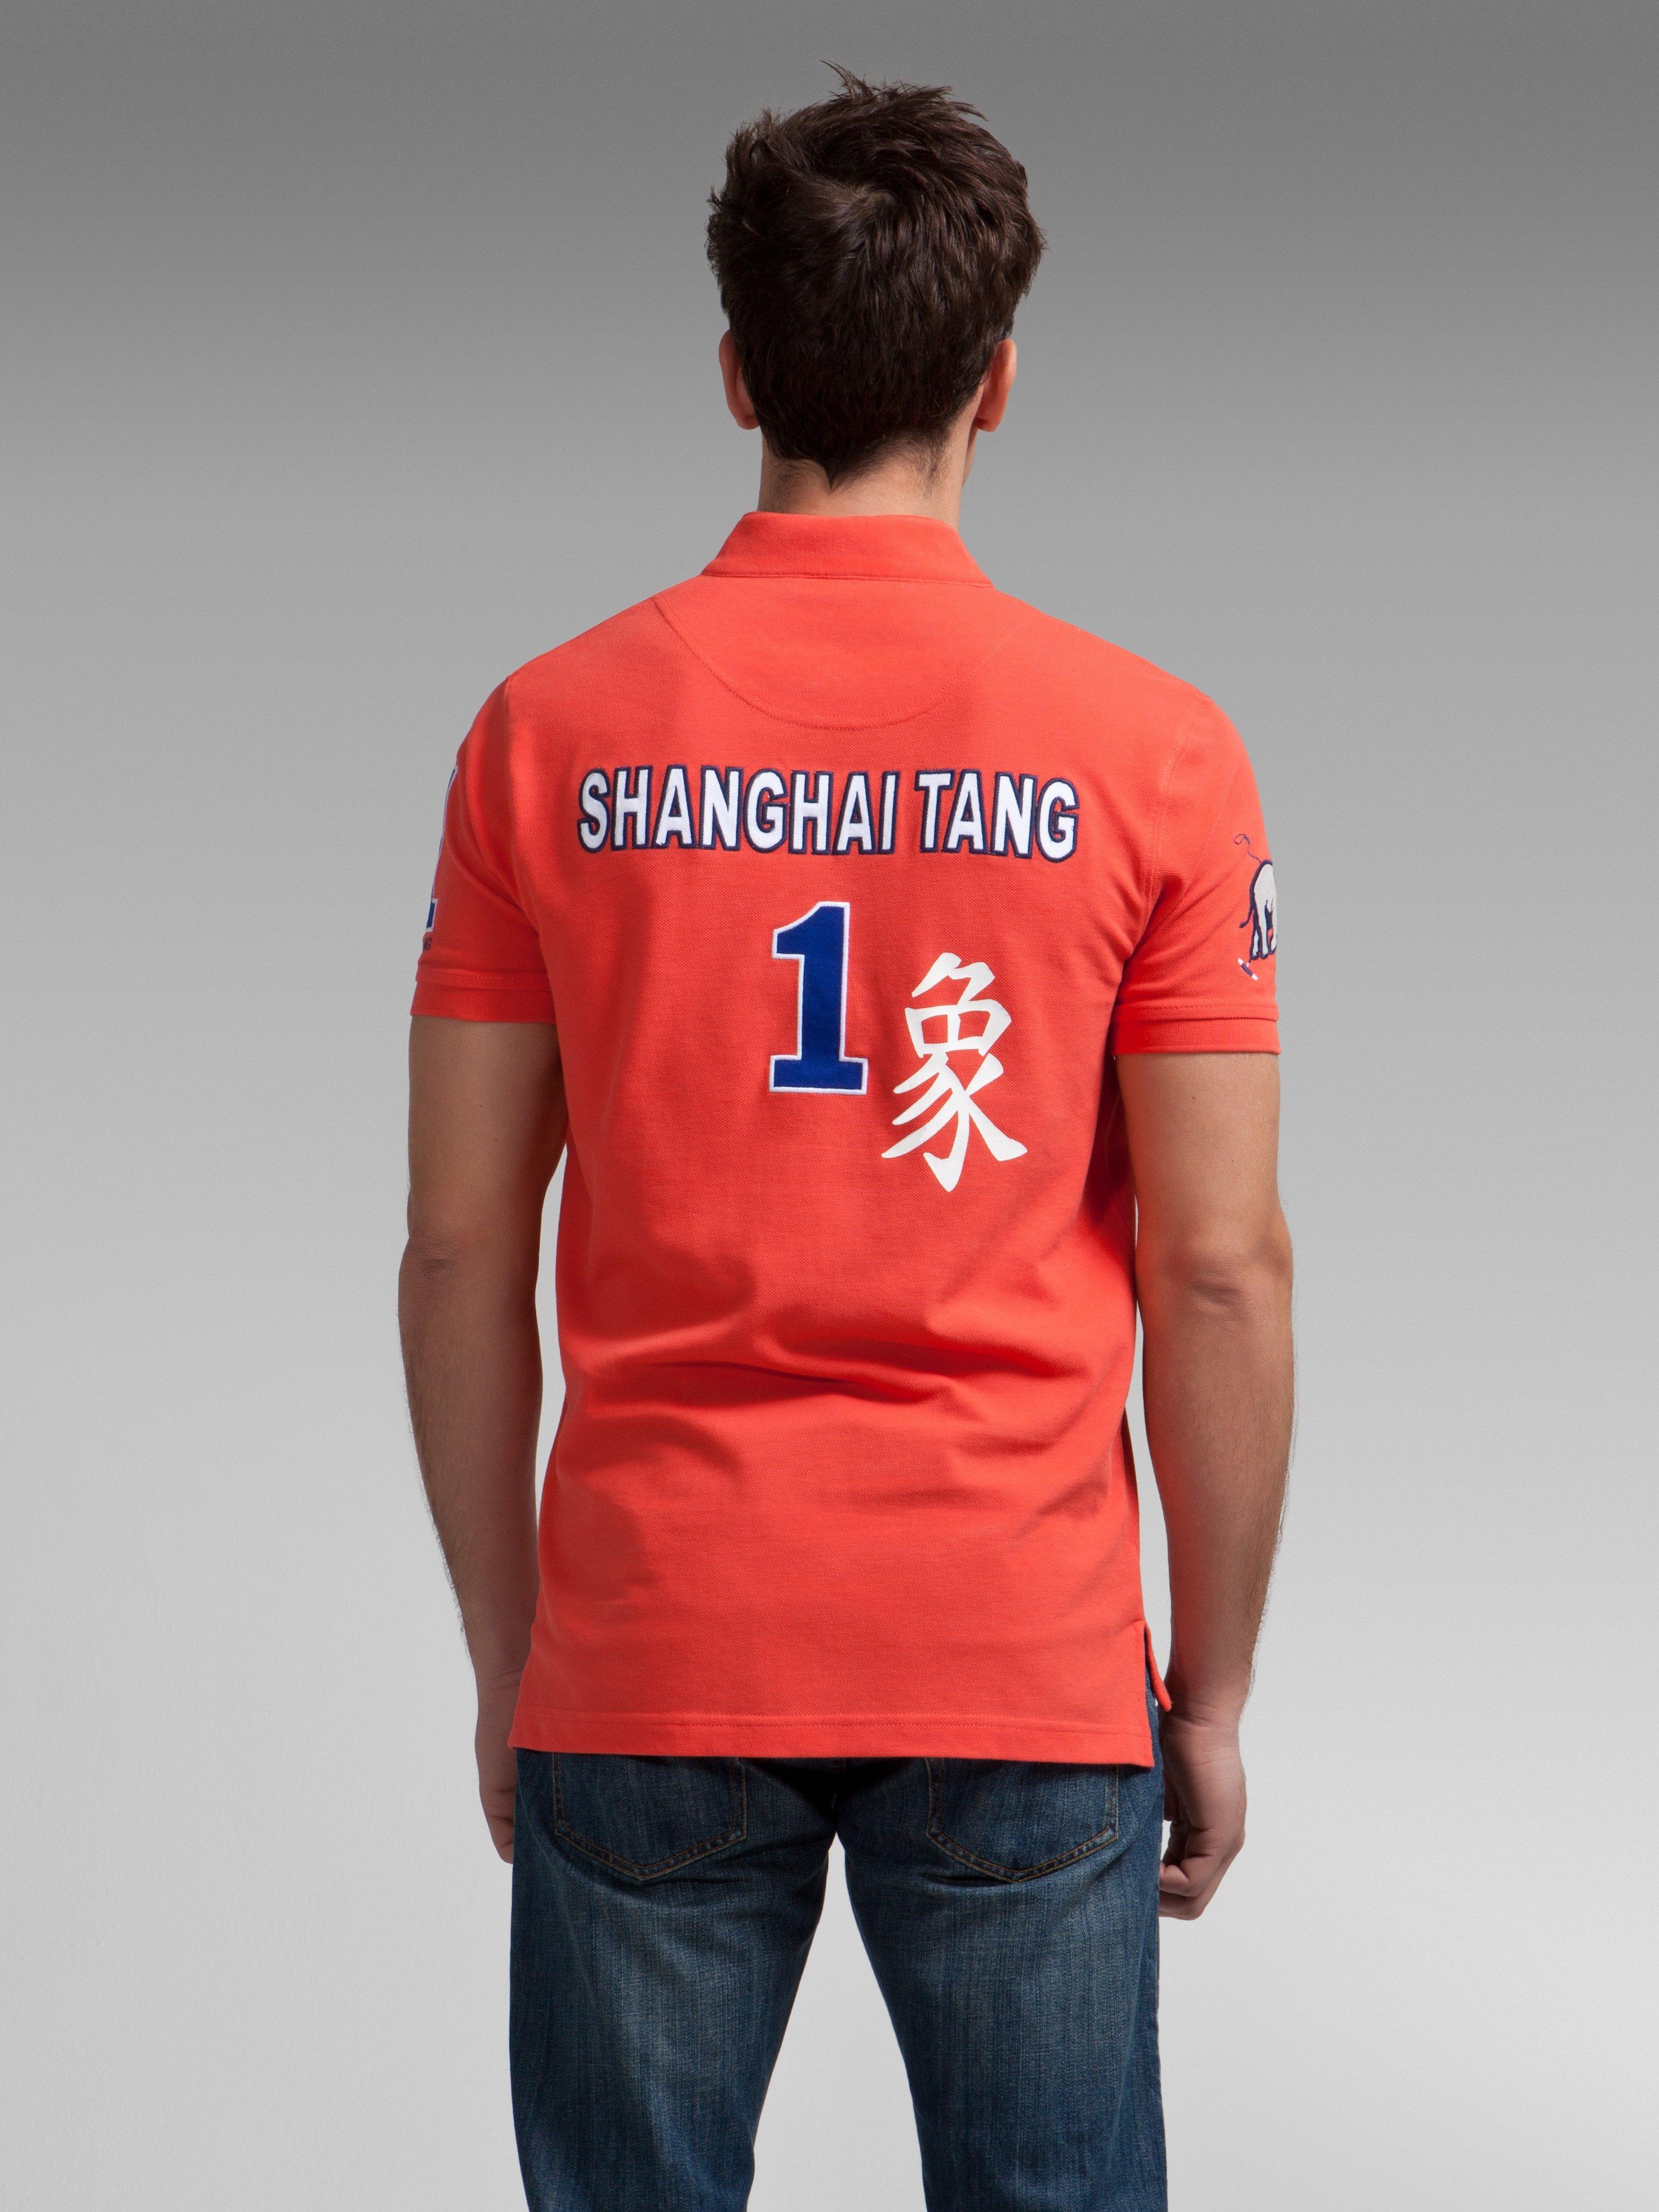 Elephant Polo Team Polo Shirt Spring 2012 Edition